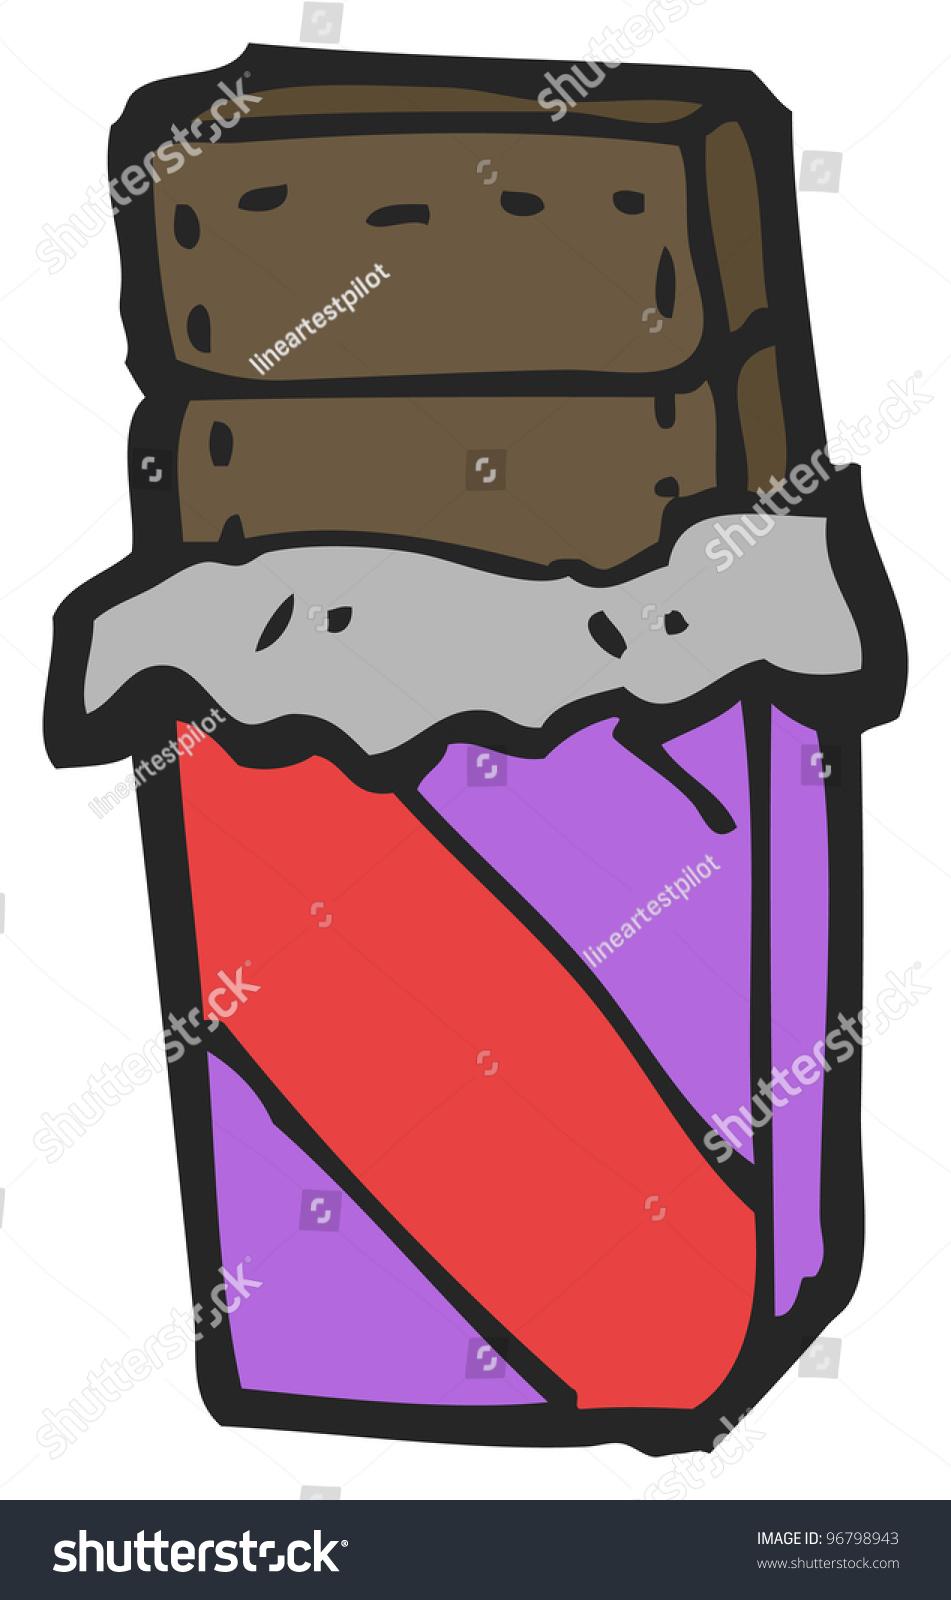 Cartoon Chocolate Bar Stock Illustration 96798943